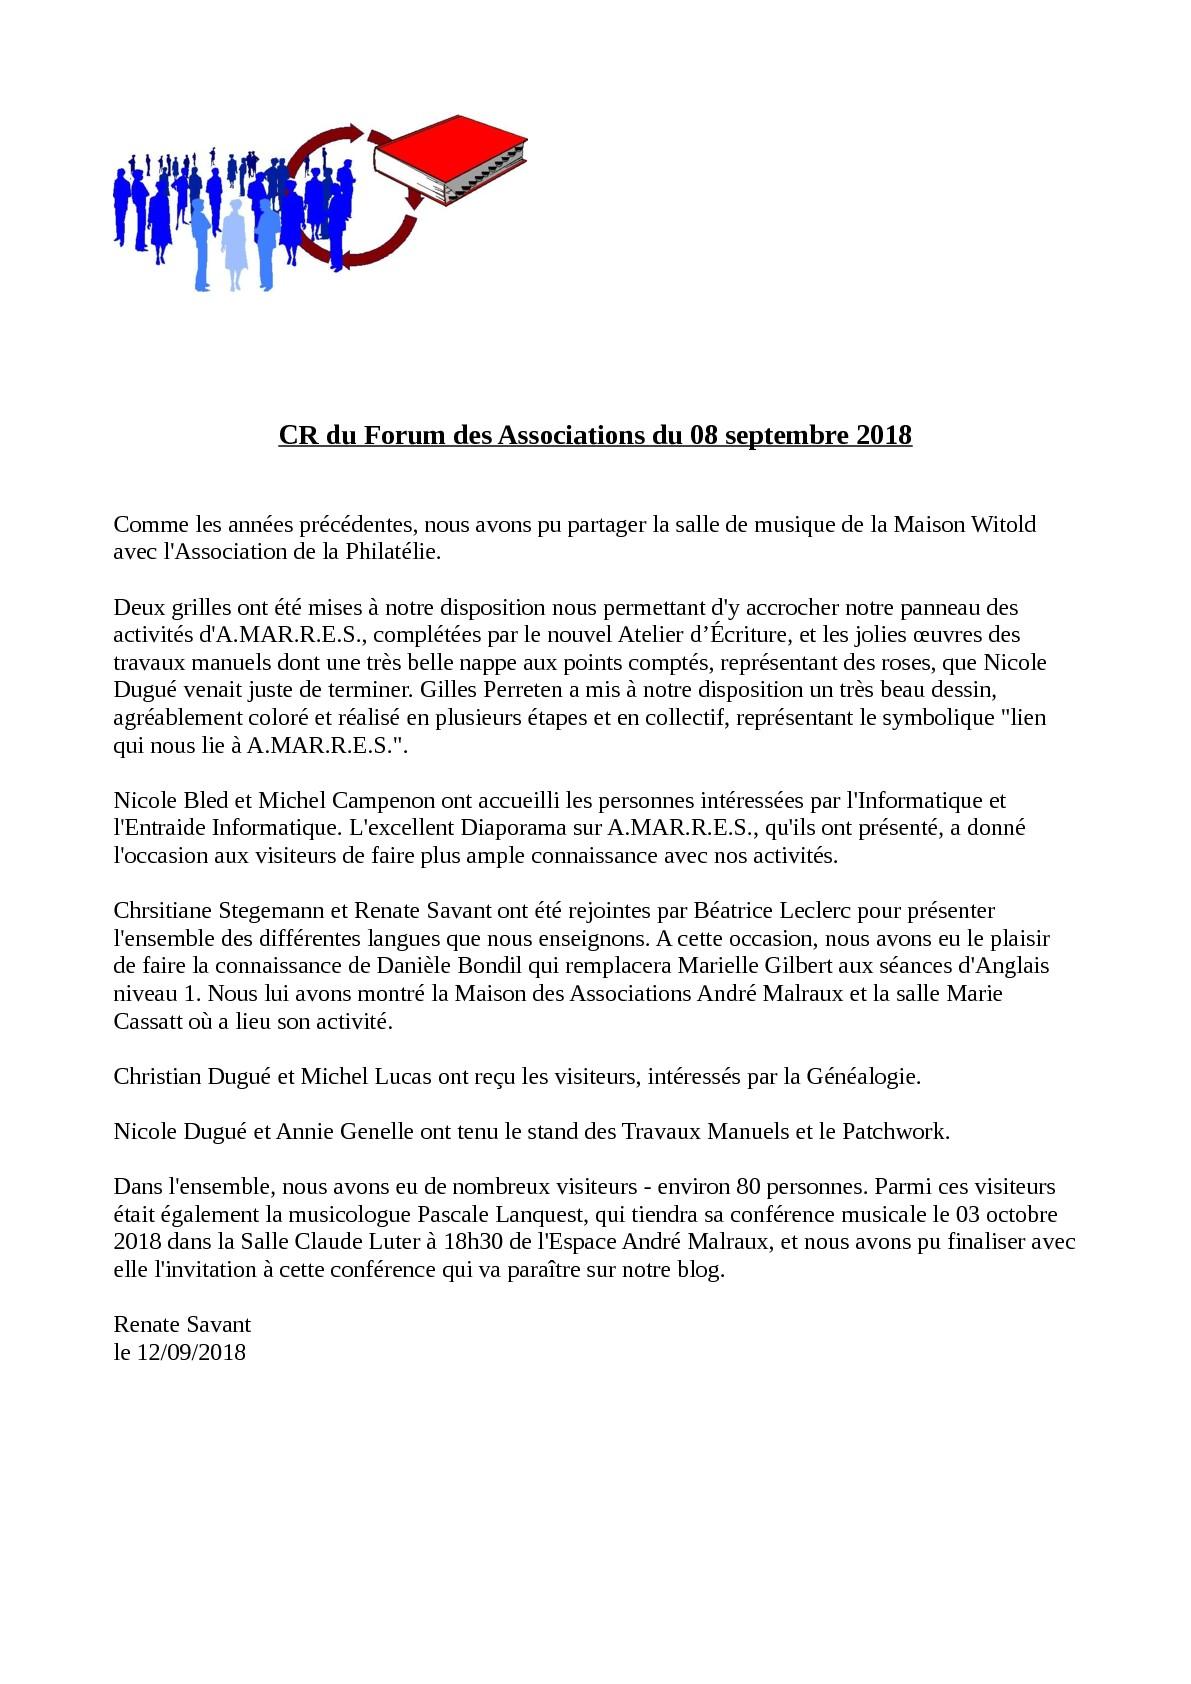 CR Forum 2018-001-001.jpg